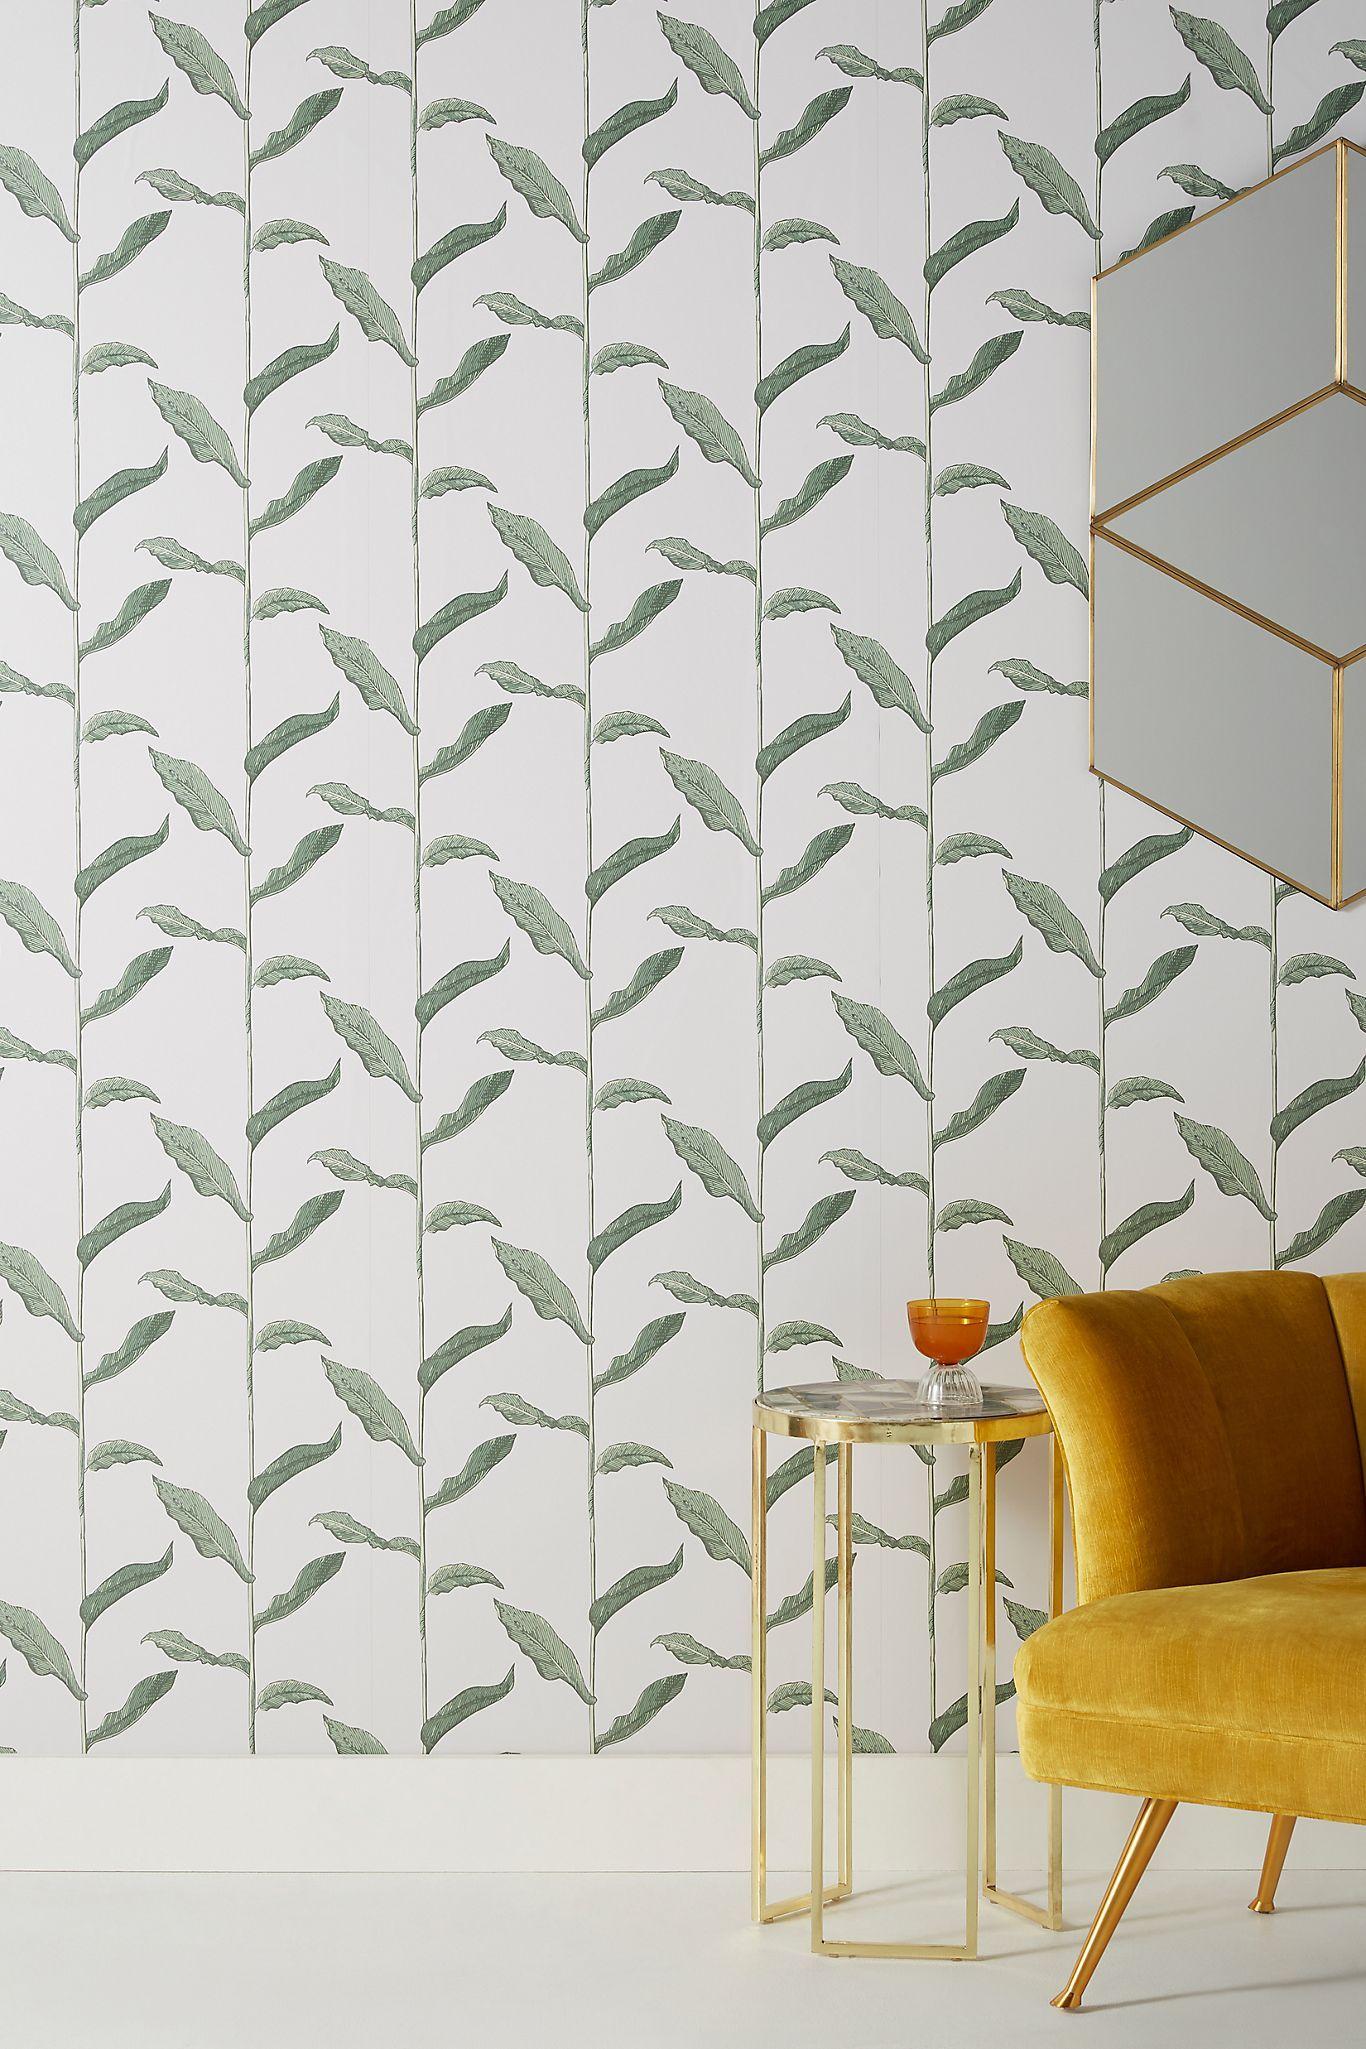 Stalks Wallpaper Contemporary Wallpaper Decor Unique Wallpaper